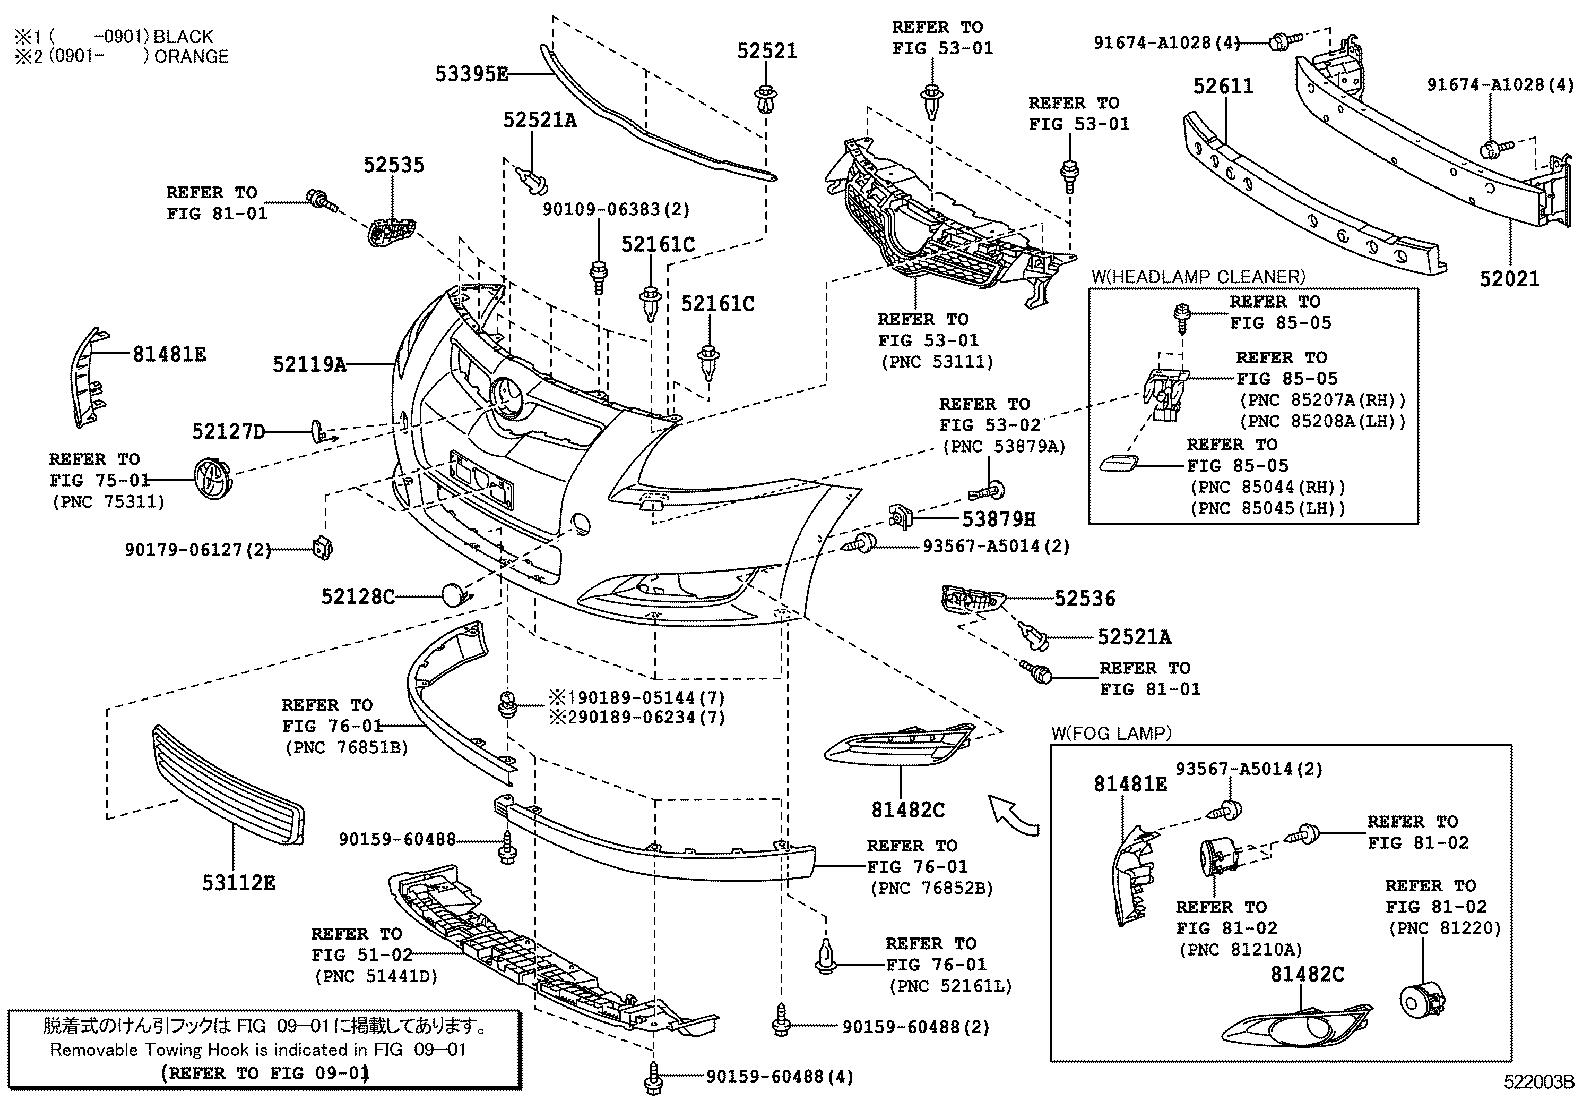 toyota auris wiring diagram isuzu npr radio yaris tundra body parts imageresizertool com